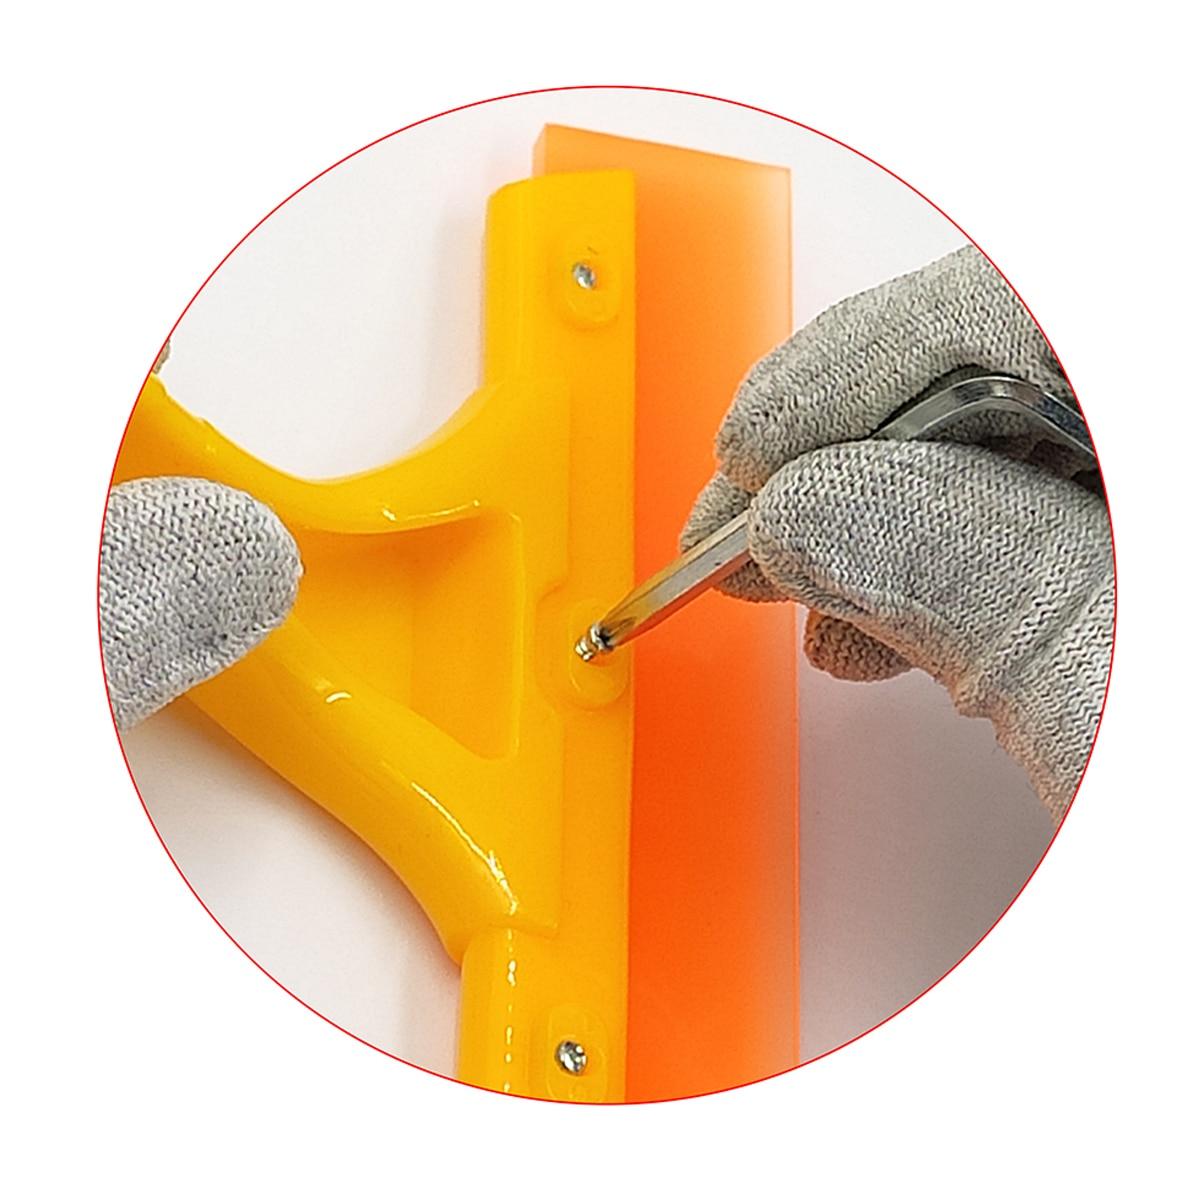 5pcs Car Window Brush Glass Cleaner Wiper Scraper Brush Cleaning Tool Household Water Blade Soap Windshield Brush 5B39 enlarge